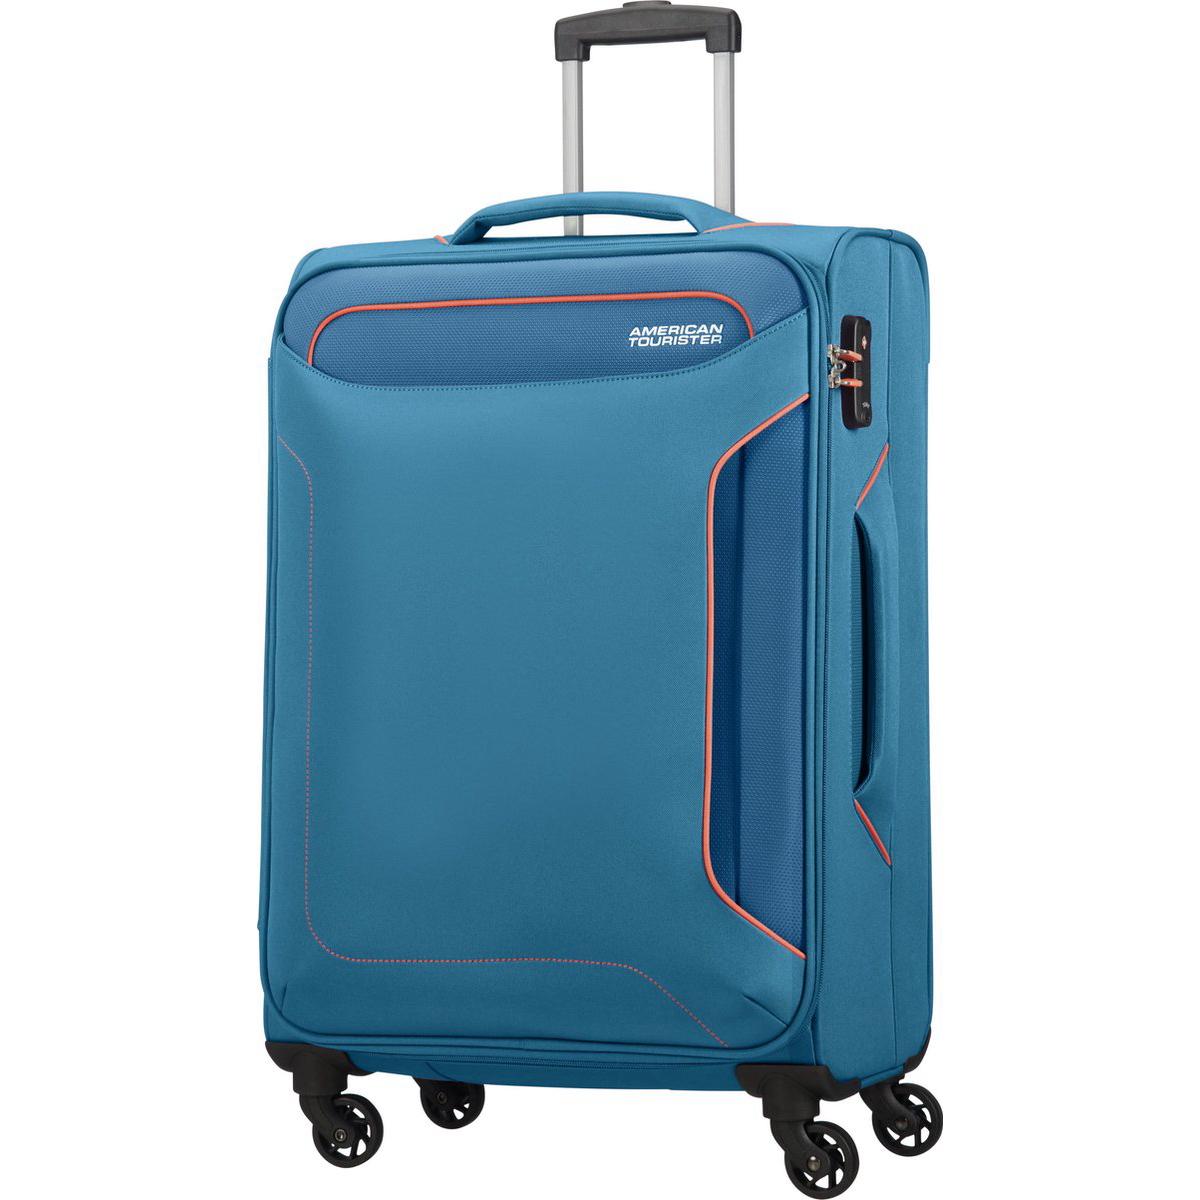 Чемодан American Tourister 4-х колесный голубой 44х275х67 см.